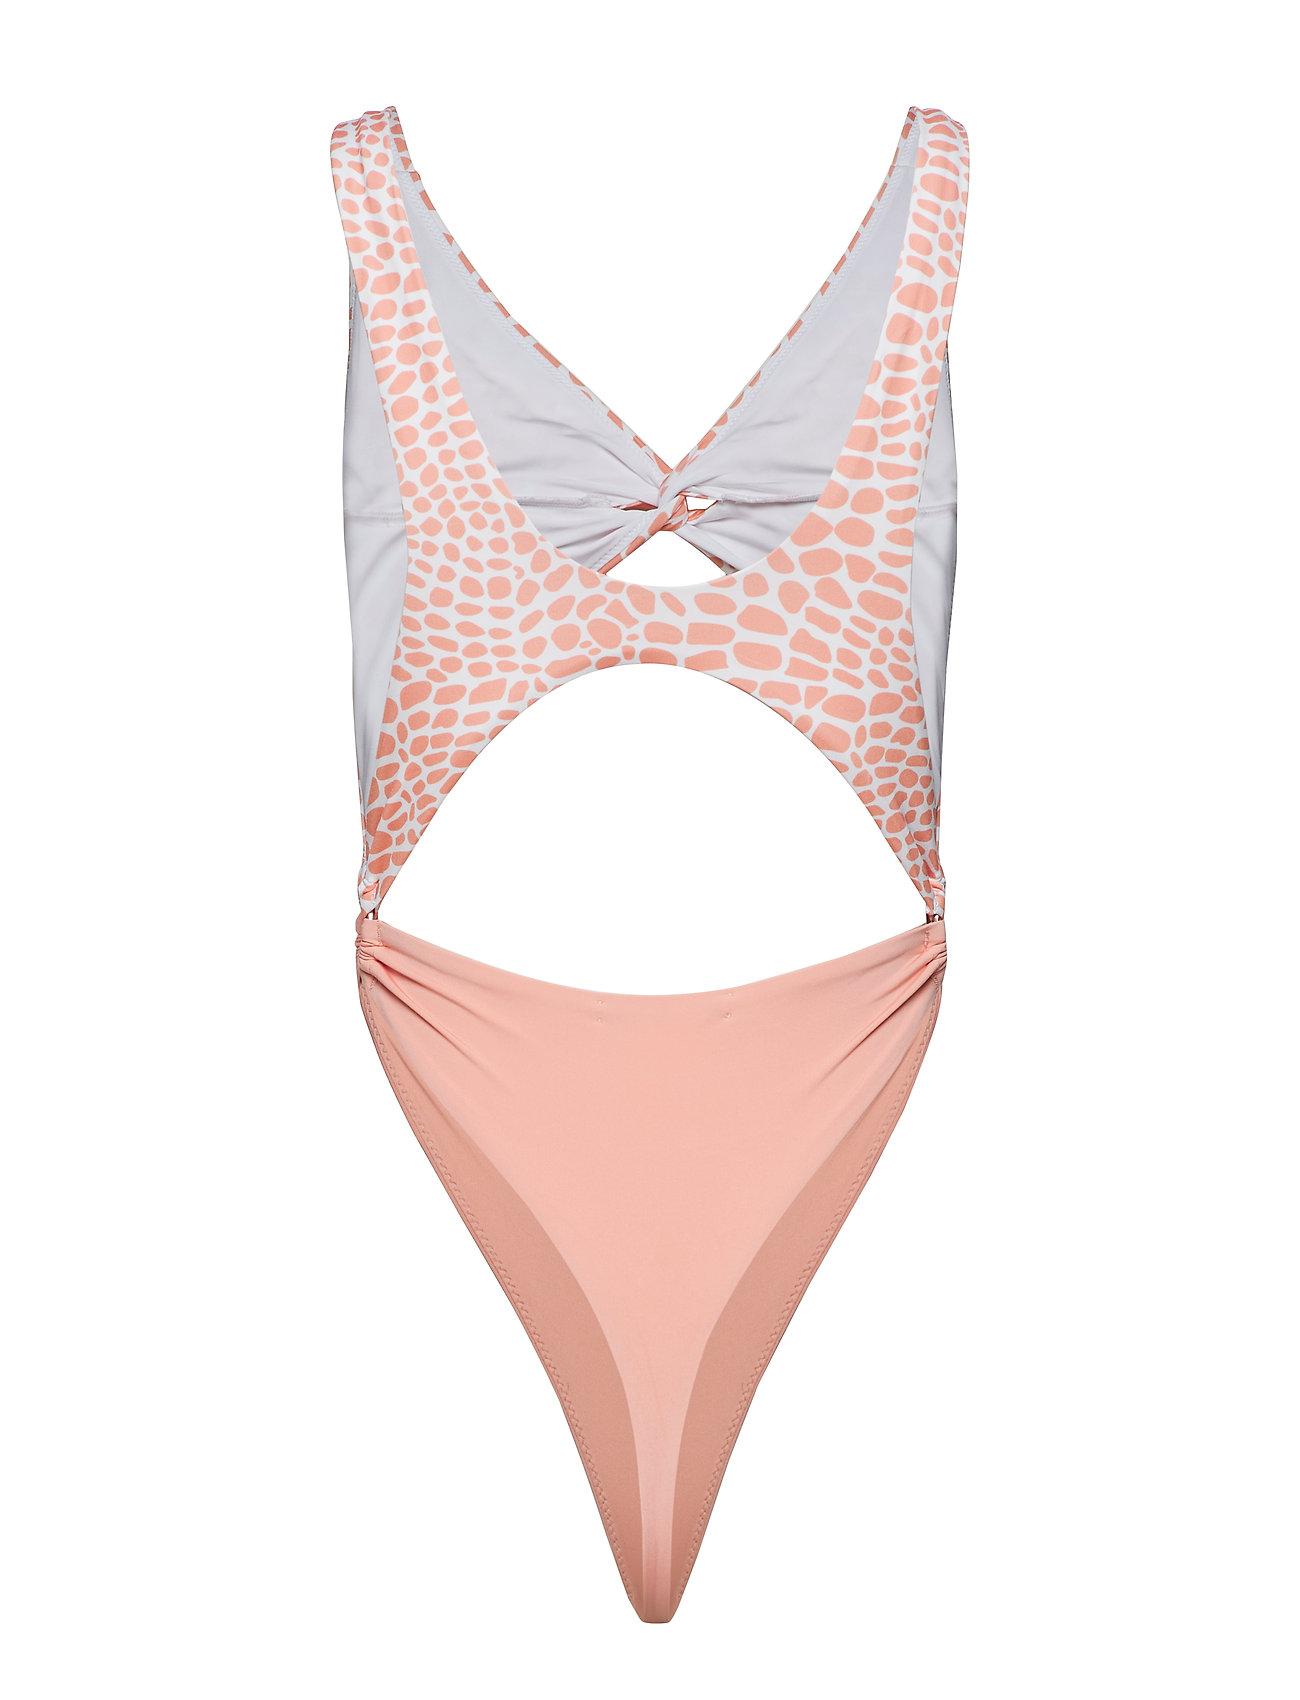 Twist Pink Printlight Swimsuitlight Front PinkIvyrevel Croco white mn0PNyOv8w